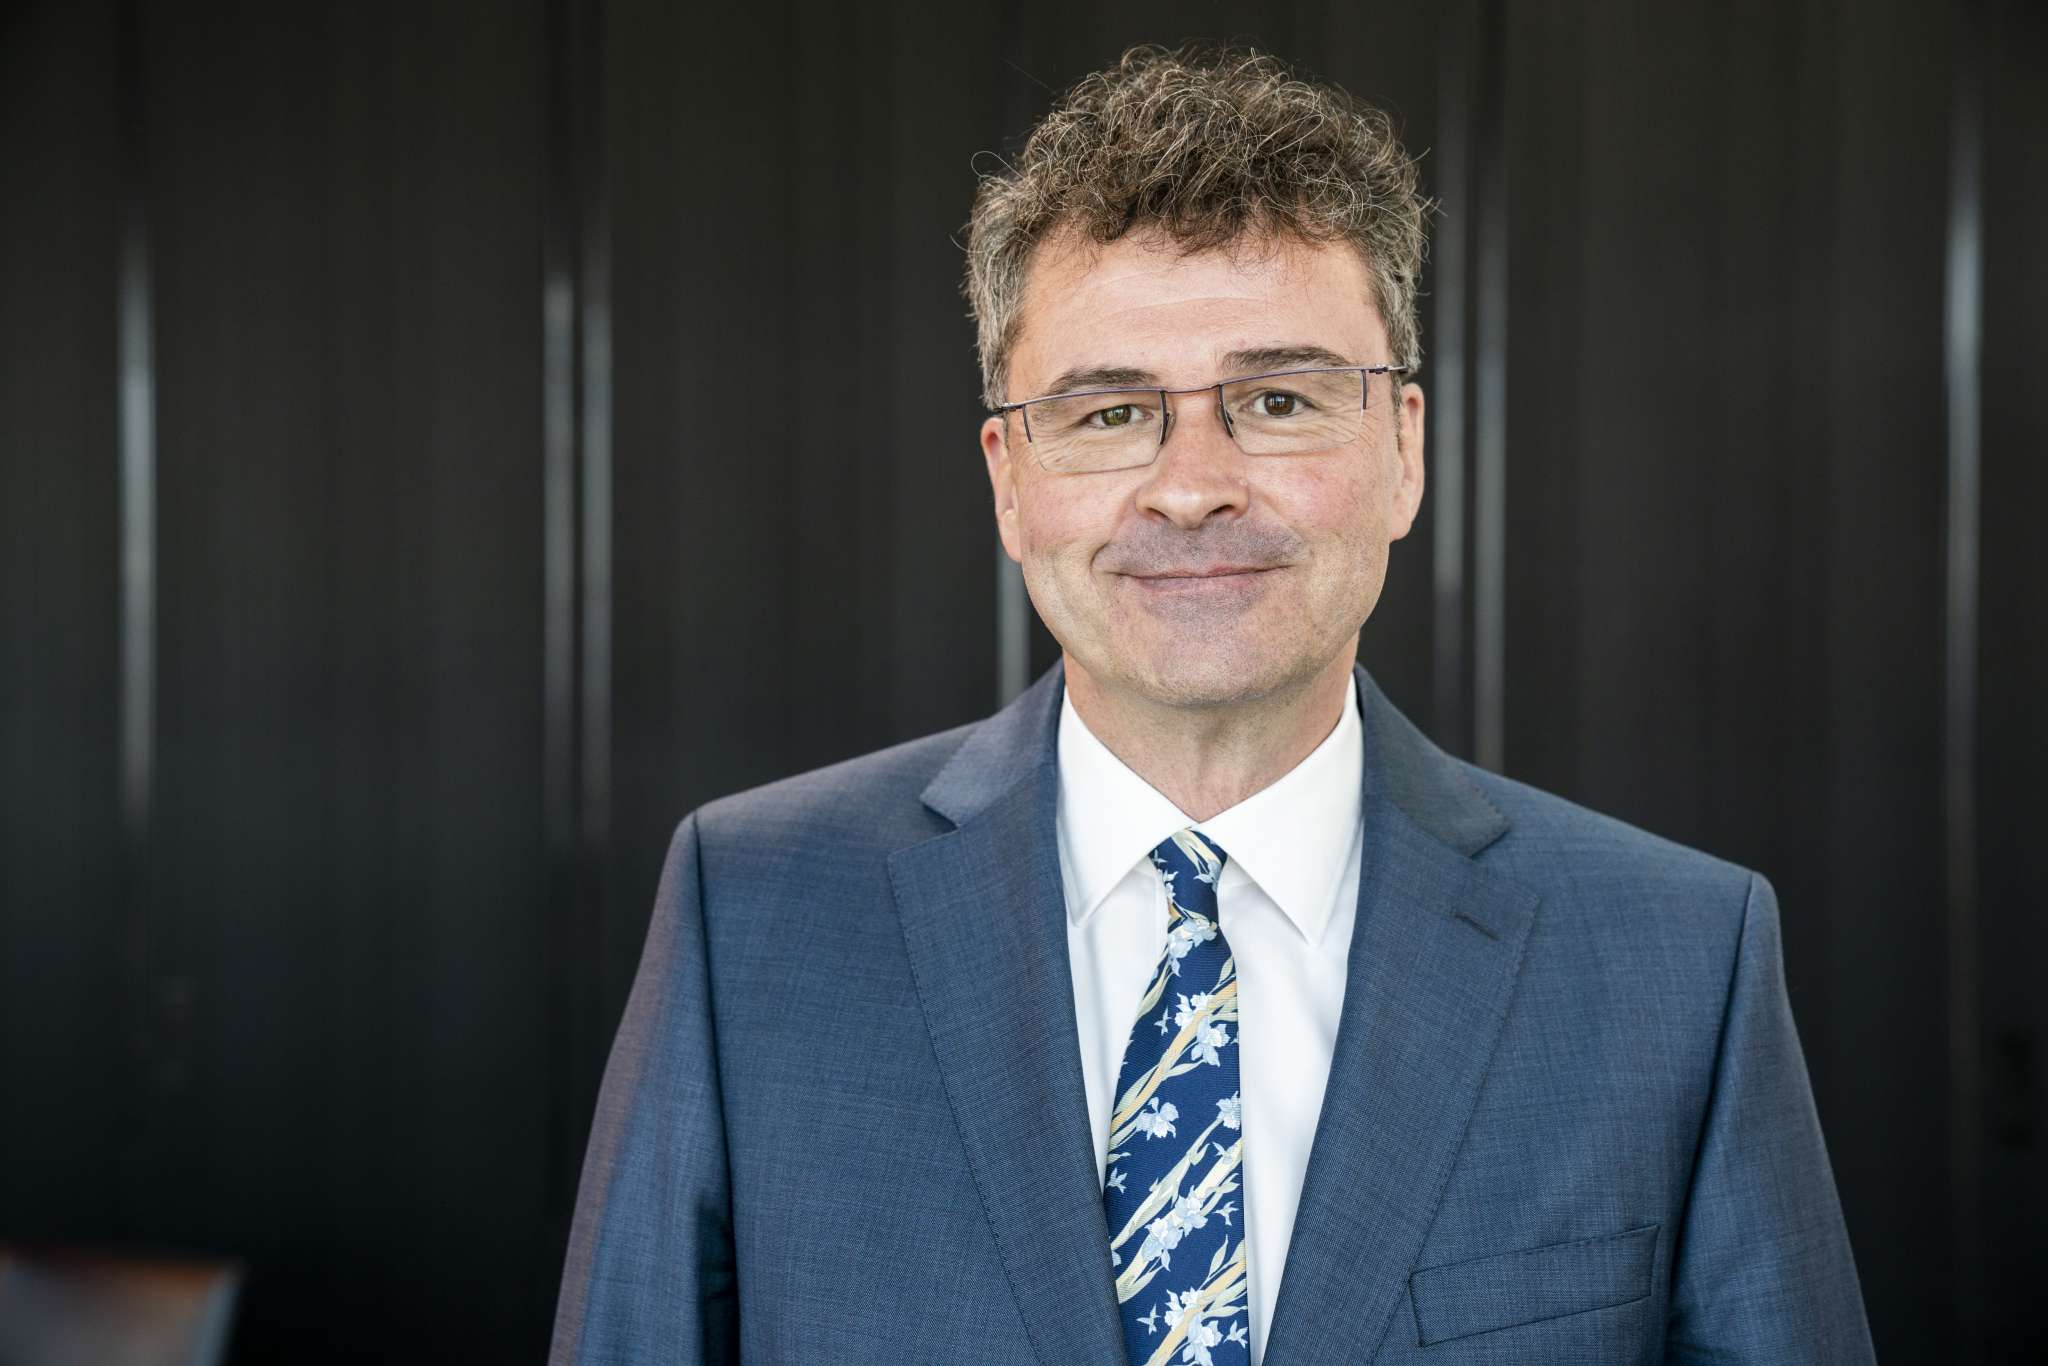 Kaspar Engeli